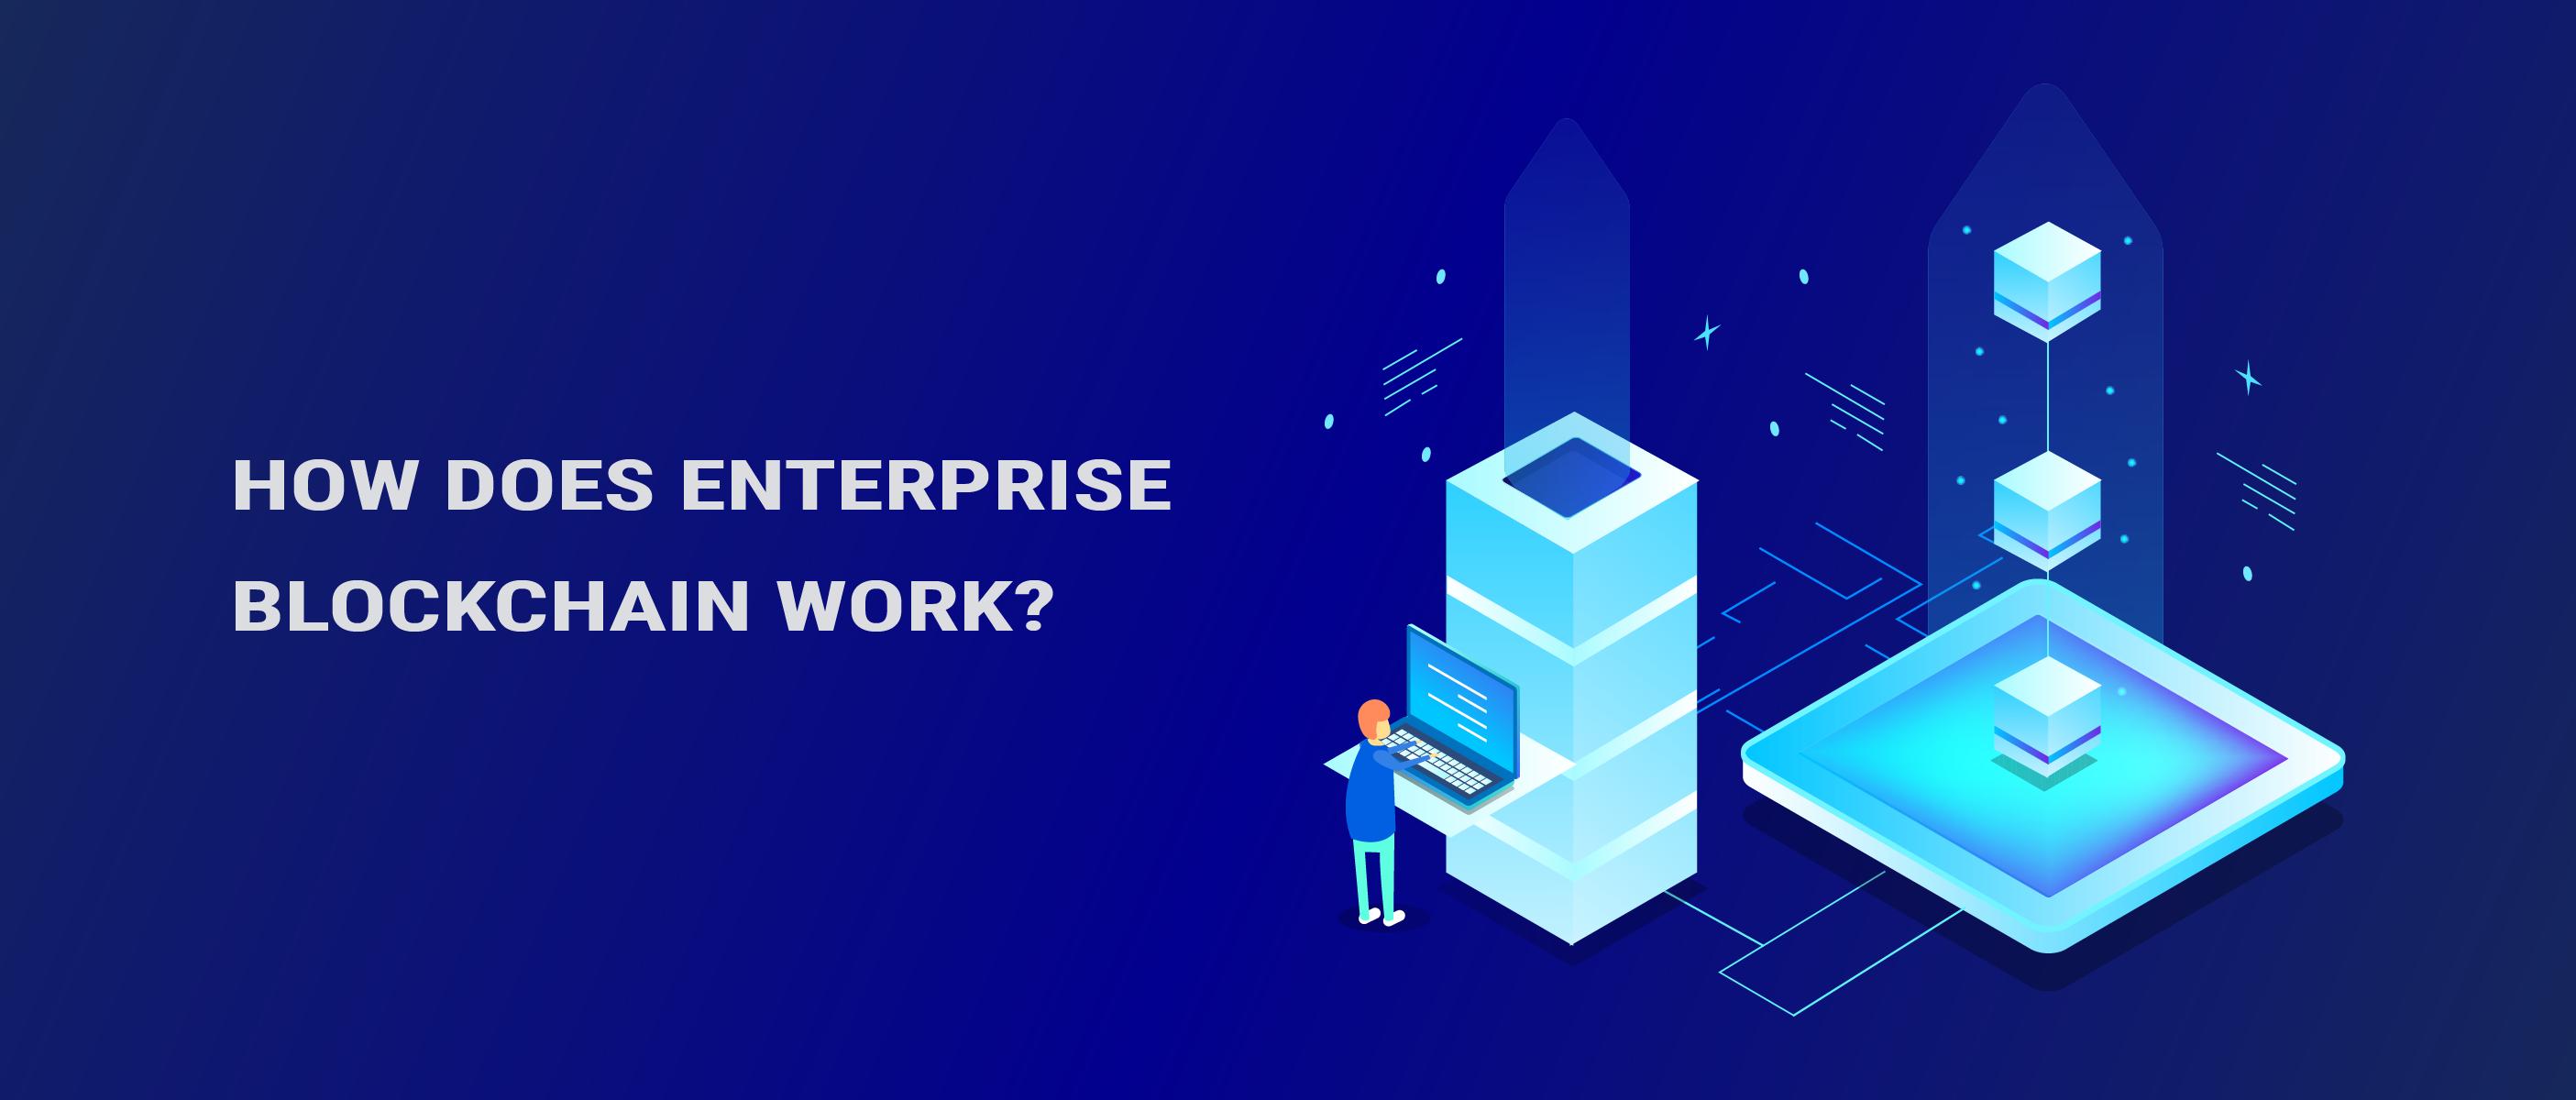 How Does Enterprise Blockchain Work?